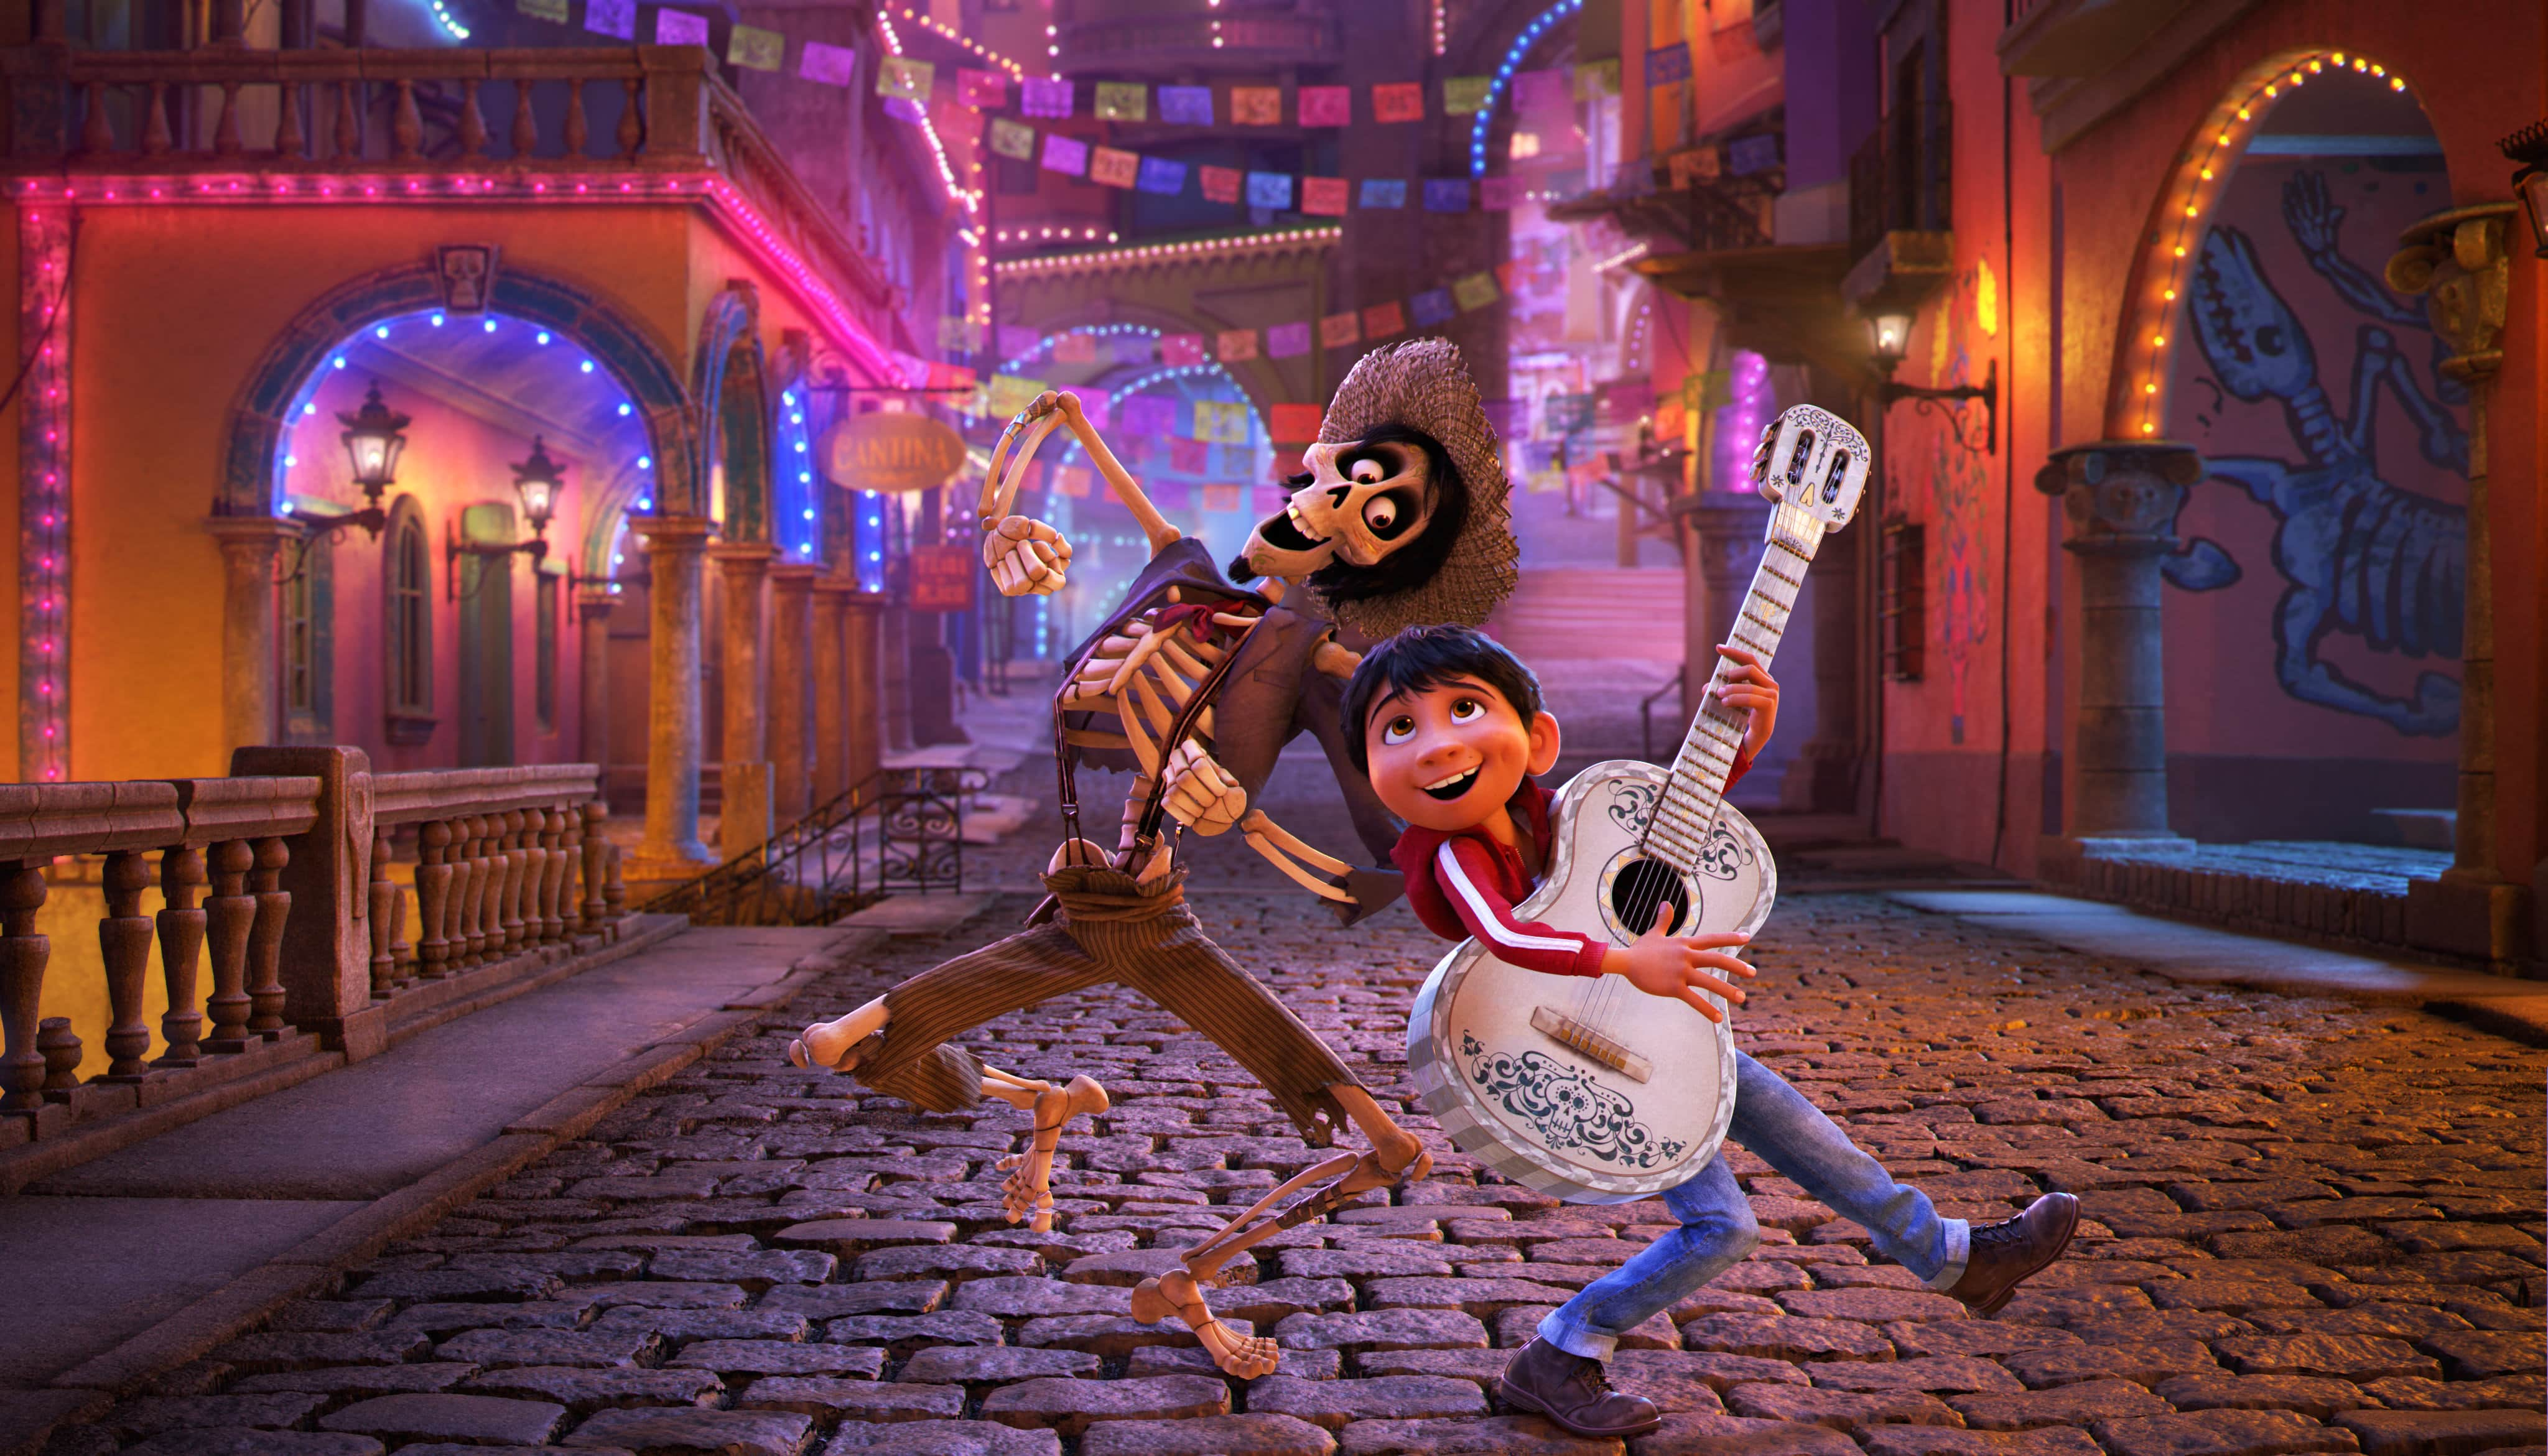 Free Printable Pixar Coco Coloring